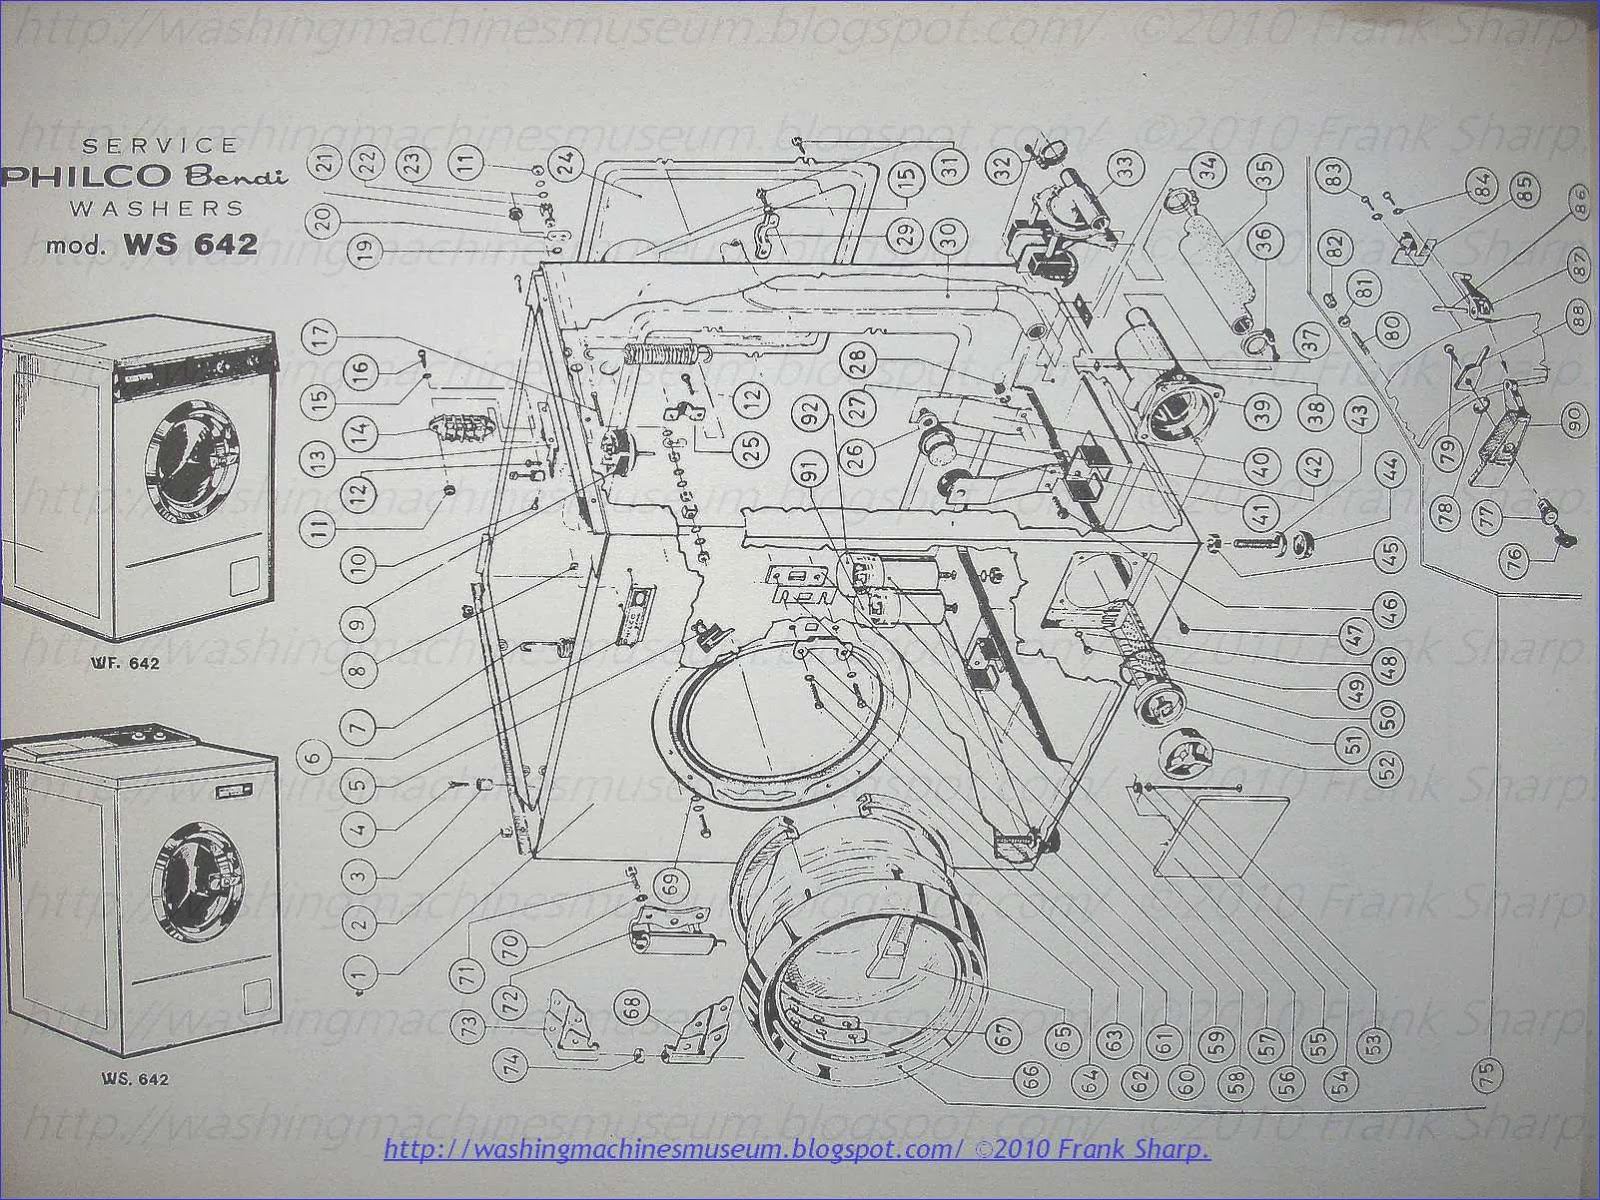 Philco Washer Motor Wiring Diagram Free Download Kenmore Washing Machine Rama Museum Bendix Ws642 Schematic